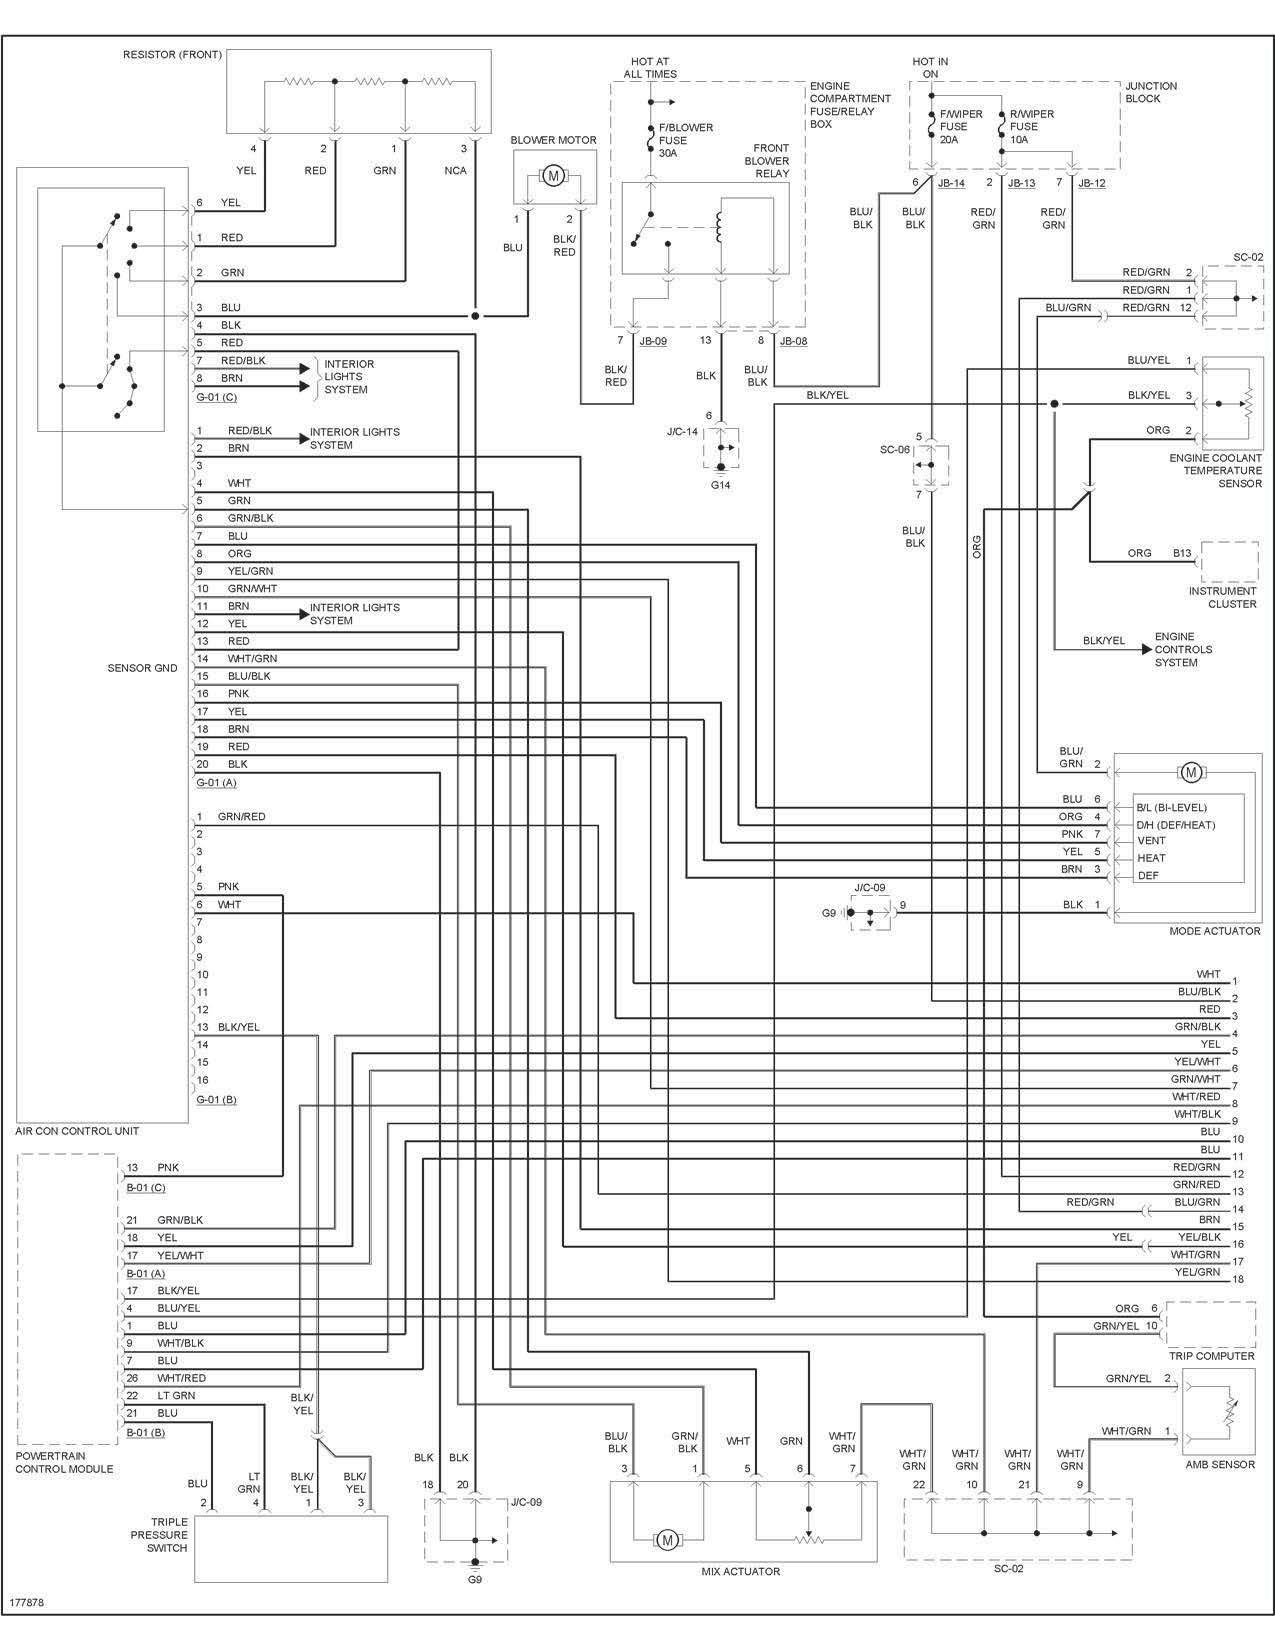 1999 Kia Sportage Wiring Diagram - 97 Rav4 Engine Diagram for Wiring Diagram  Schematics | 99 Kia Sportage Engine Diagram |  | Wiring Diagram Schematics